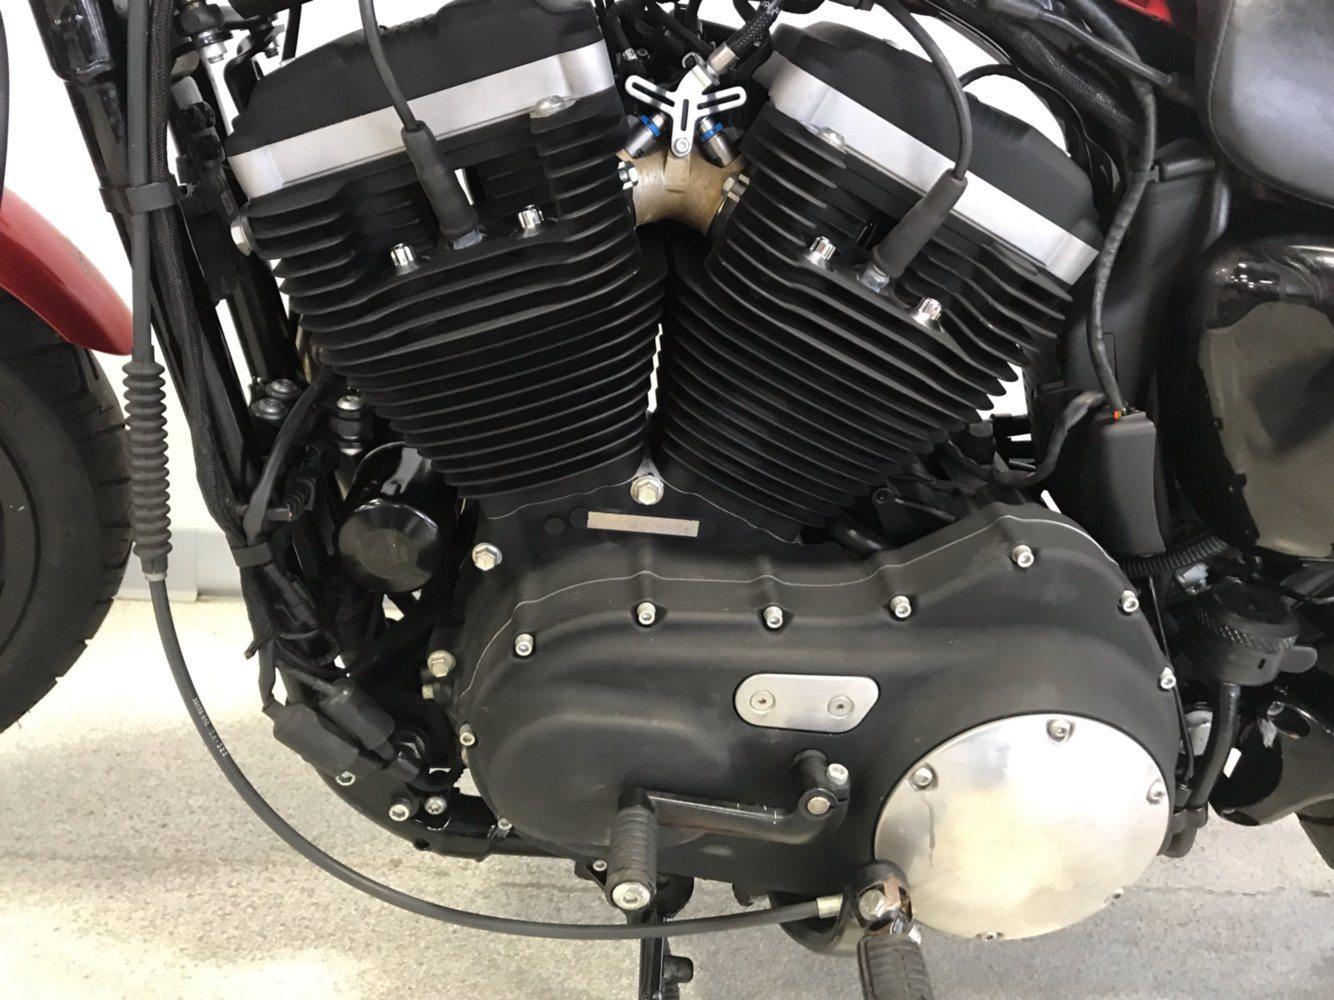 2013 Harley-Davidson Sportster® Iron 883™ in Springfield, Missouri